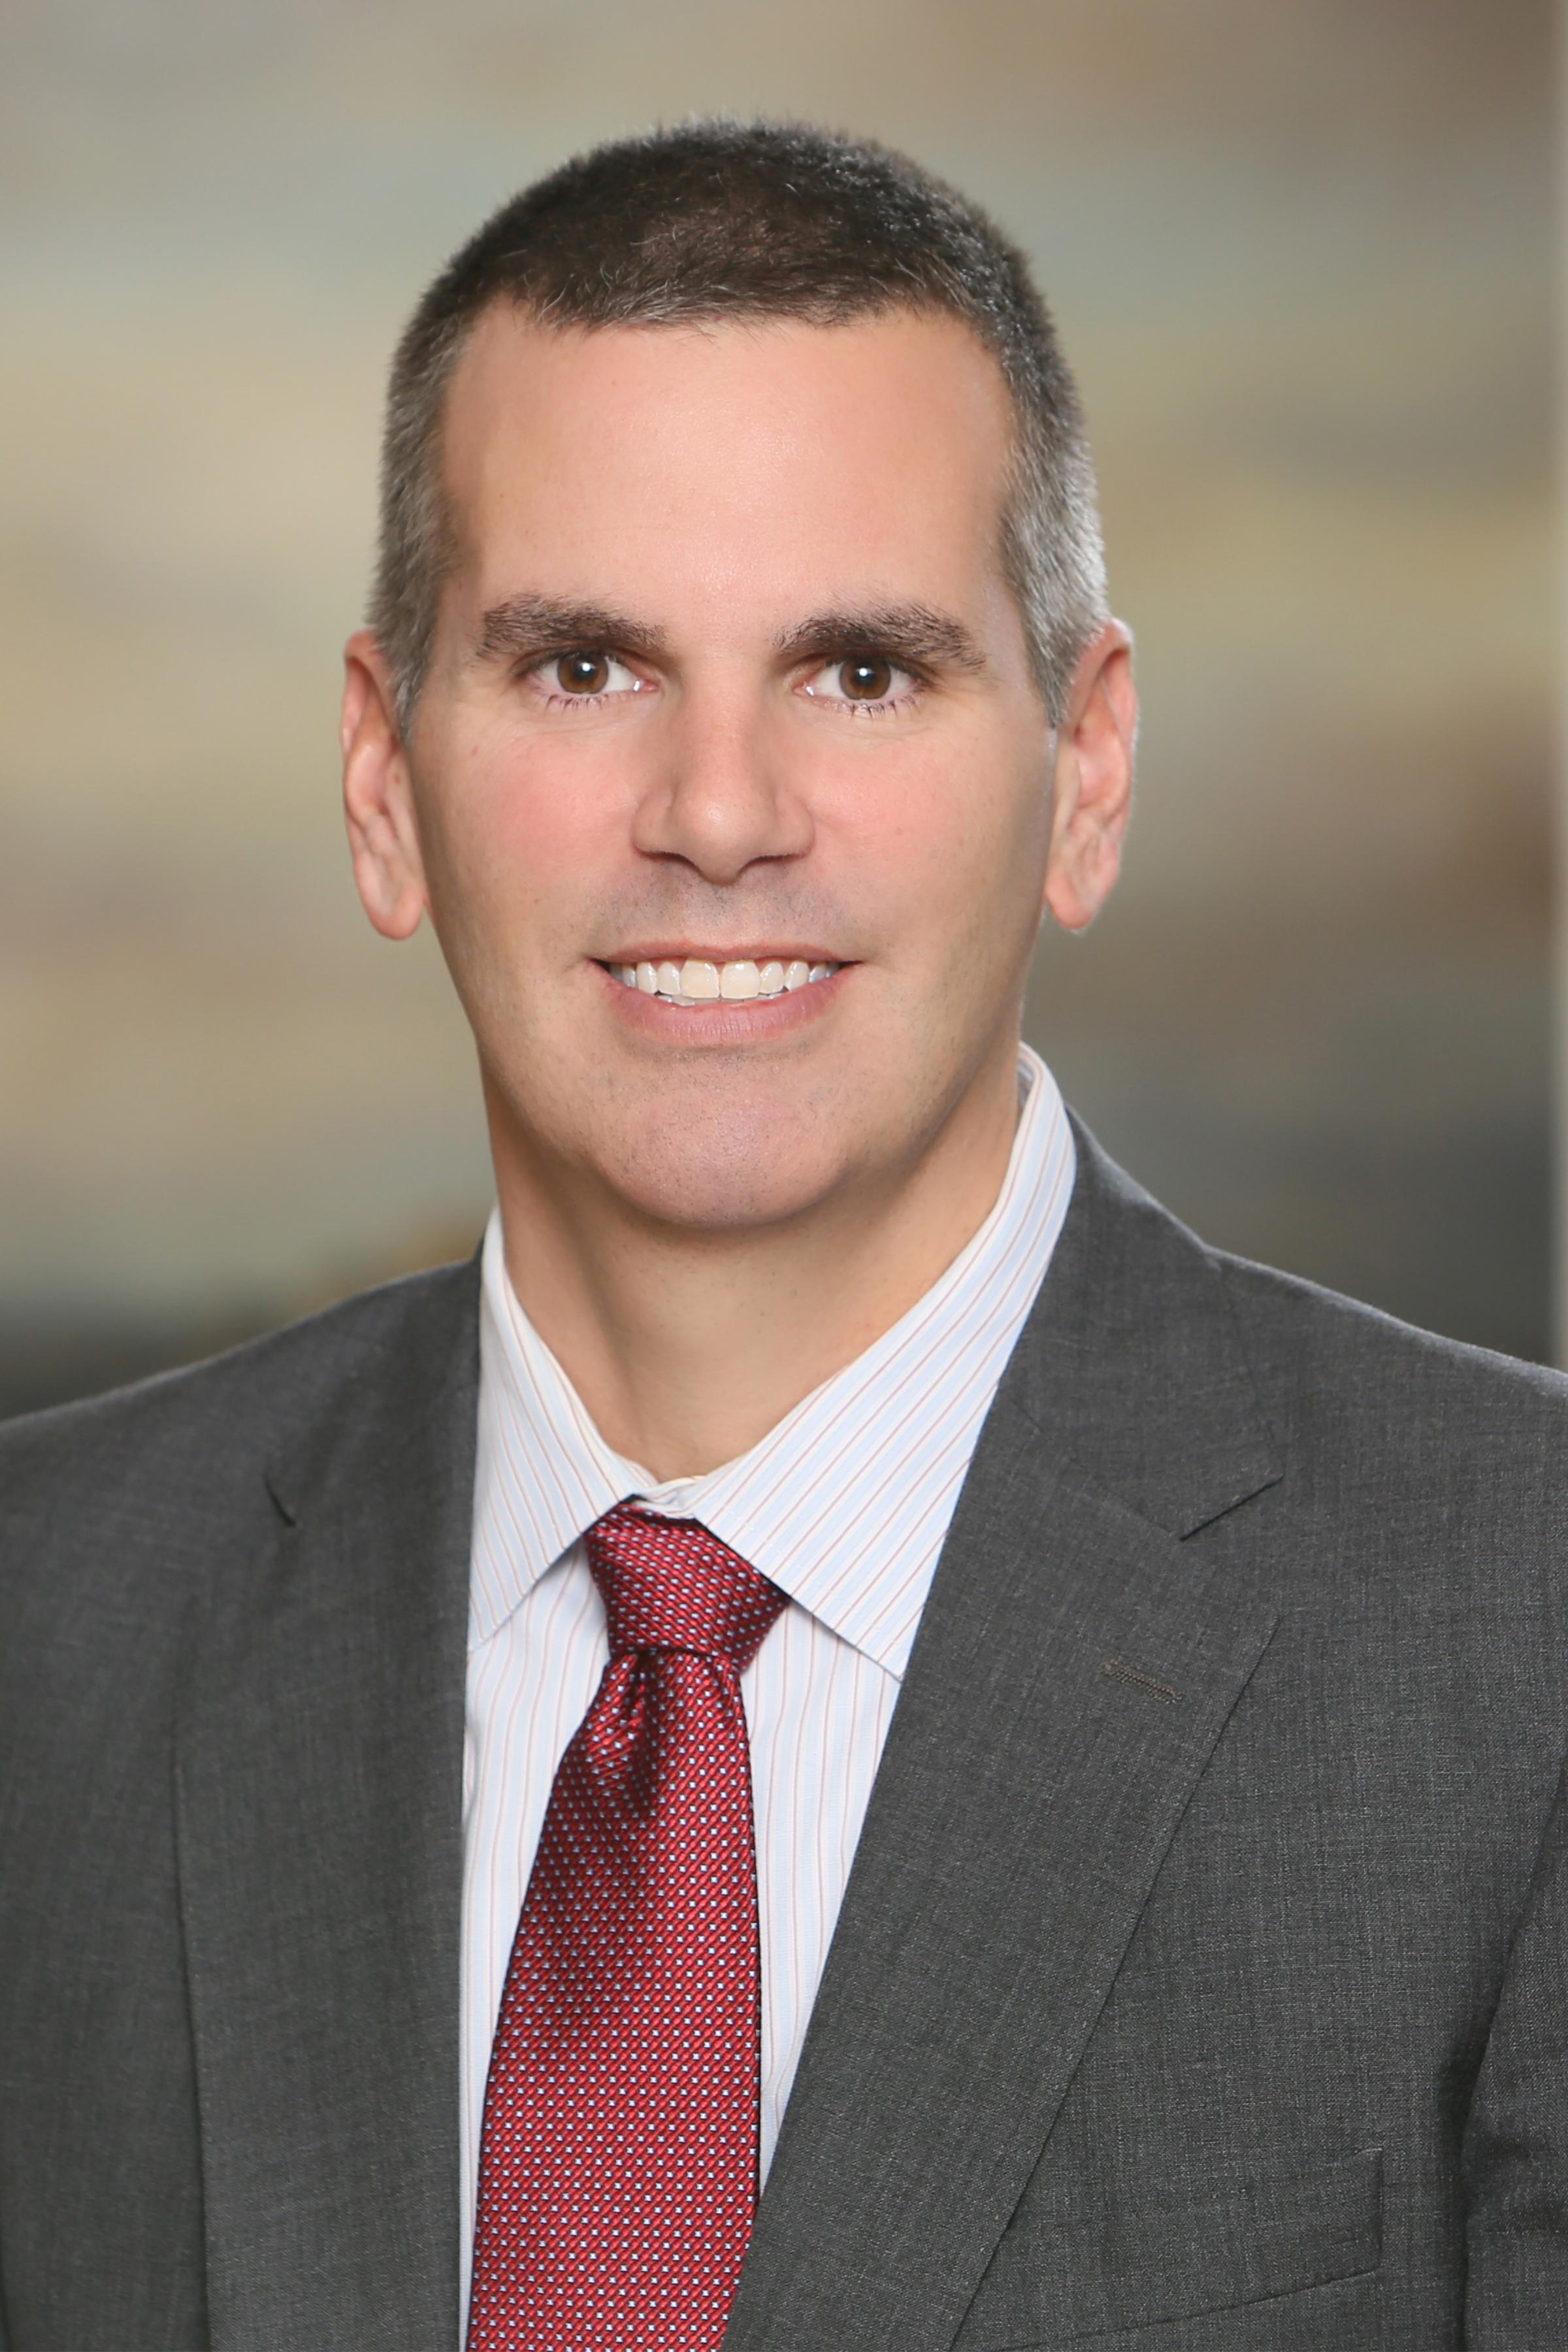 Phillip J. Haberthur - Associate